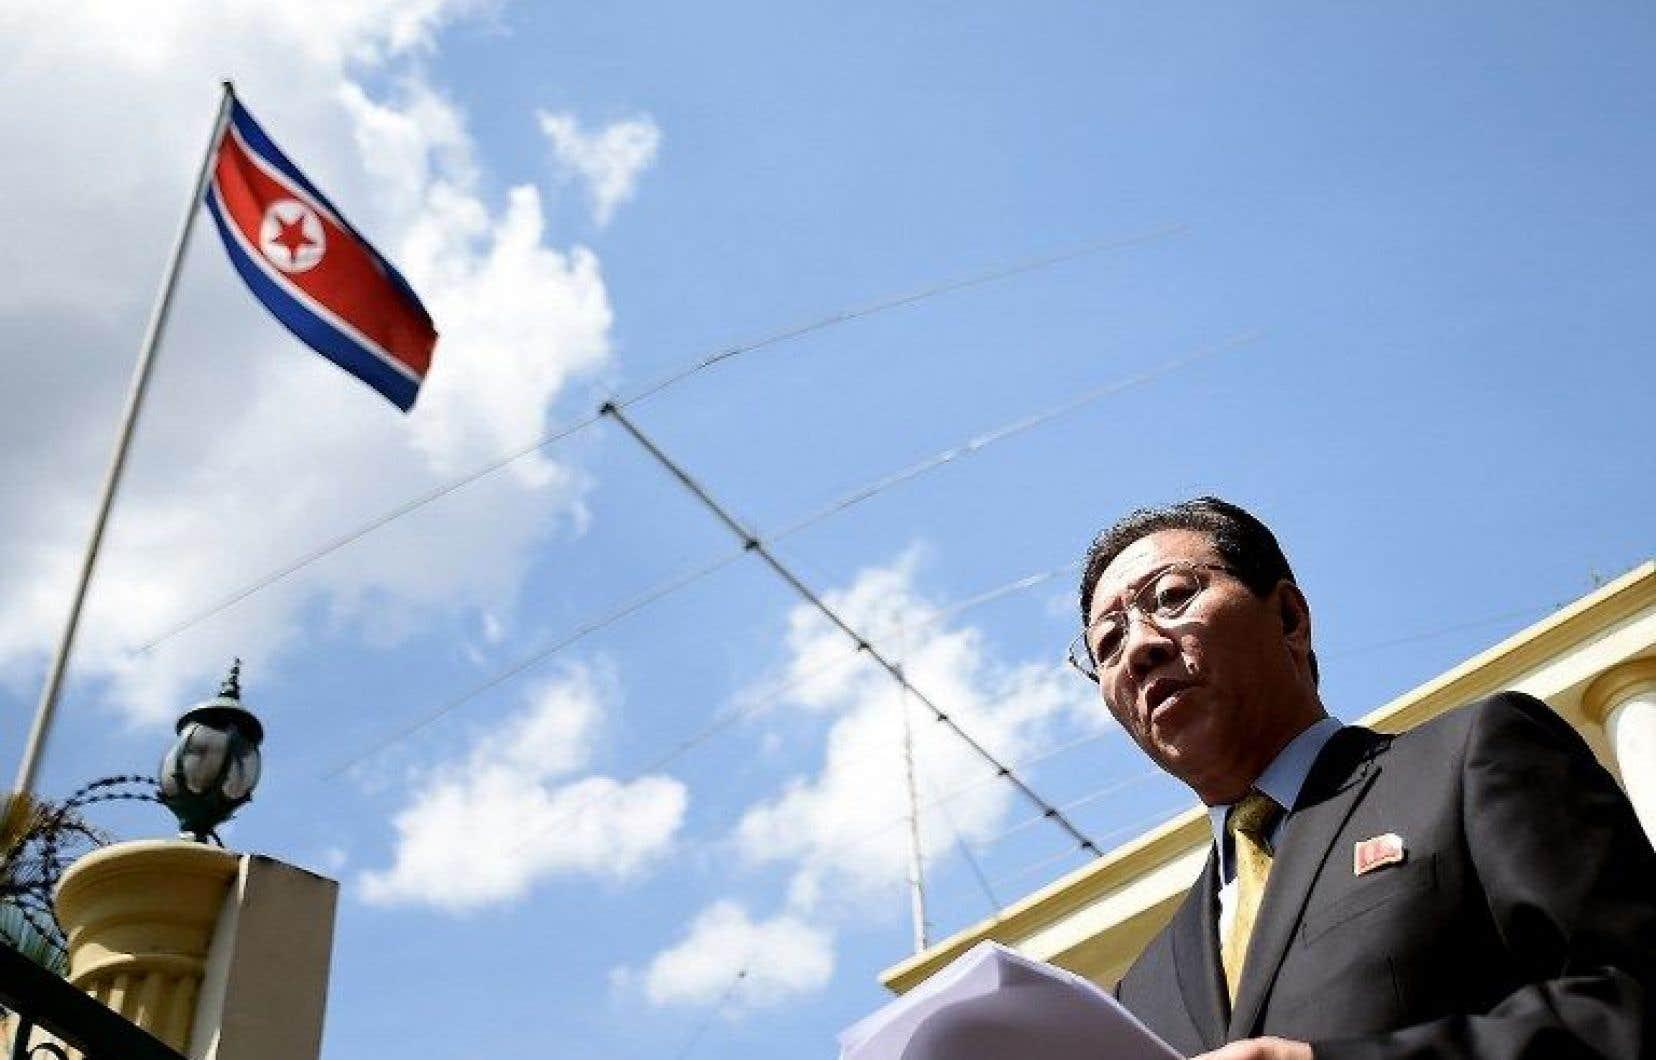 L'ambassadeur de Corée du Nord en Malaisie, Kang Chol